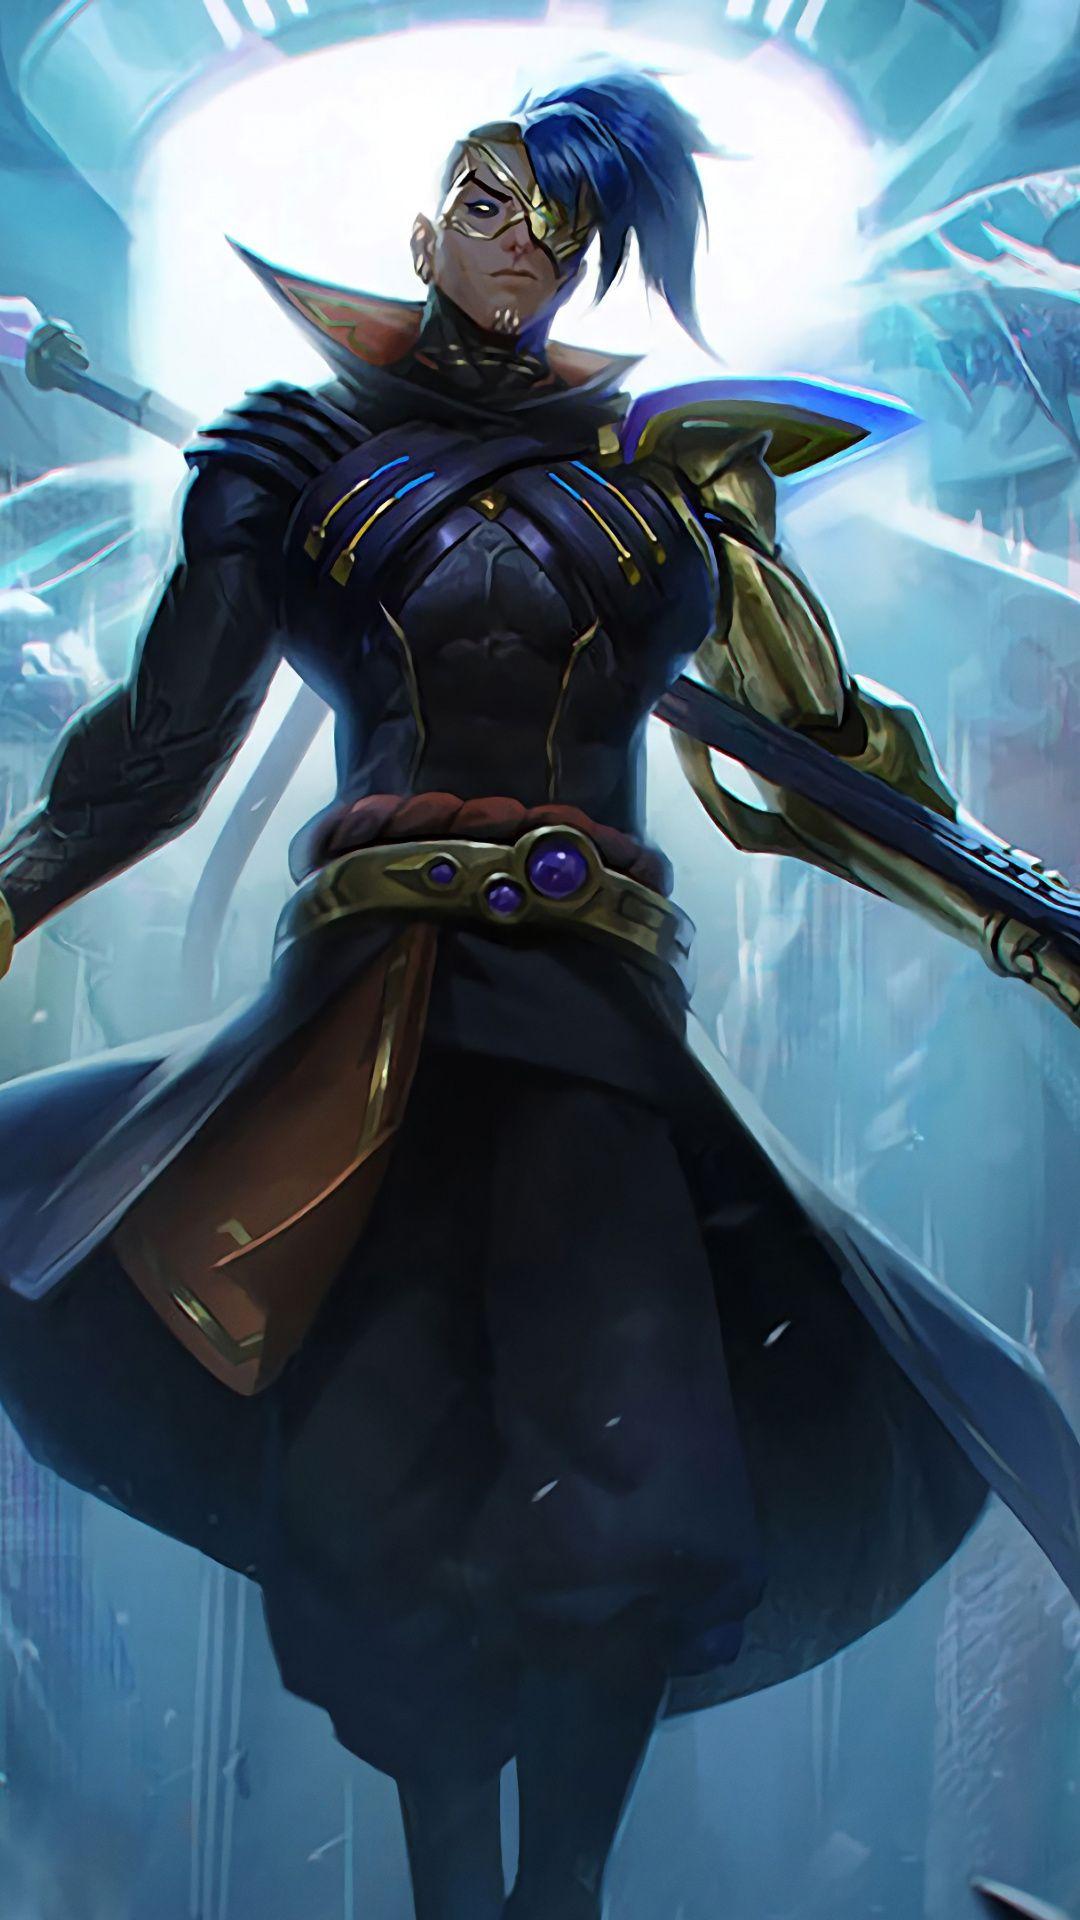 Kayn Warrior Online Game League Of Legends 1080x1920 Wallpaper League Of Legends Poster League Of Legends Lol League Of Legends